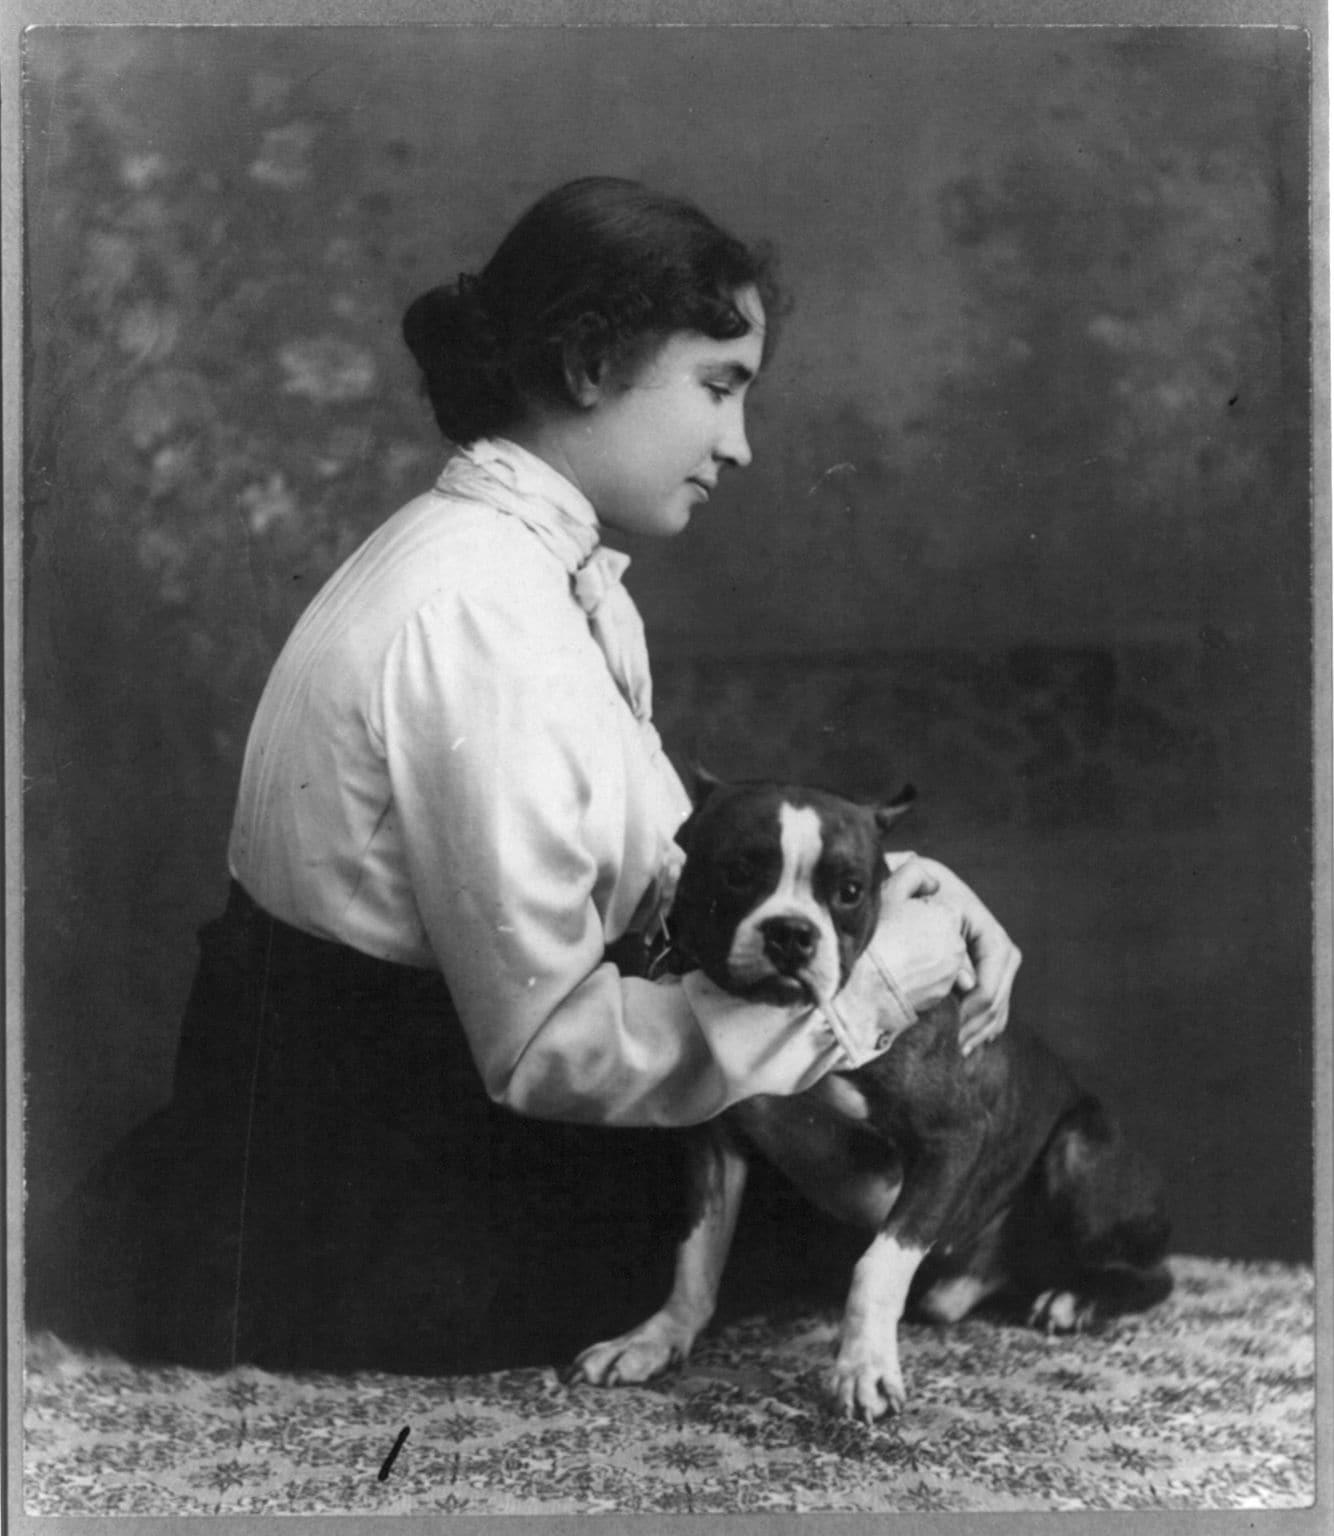 Trailblazers Louis Braille And Helen Keller Opened New